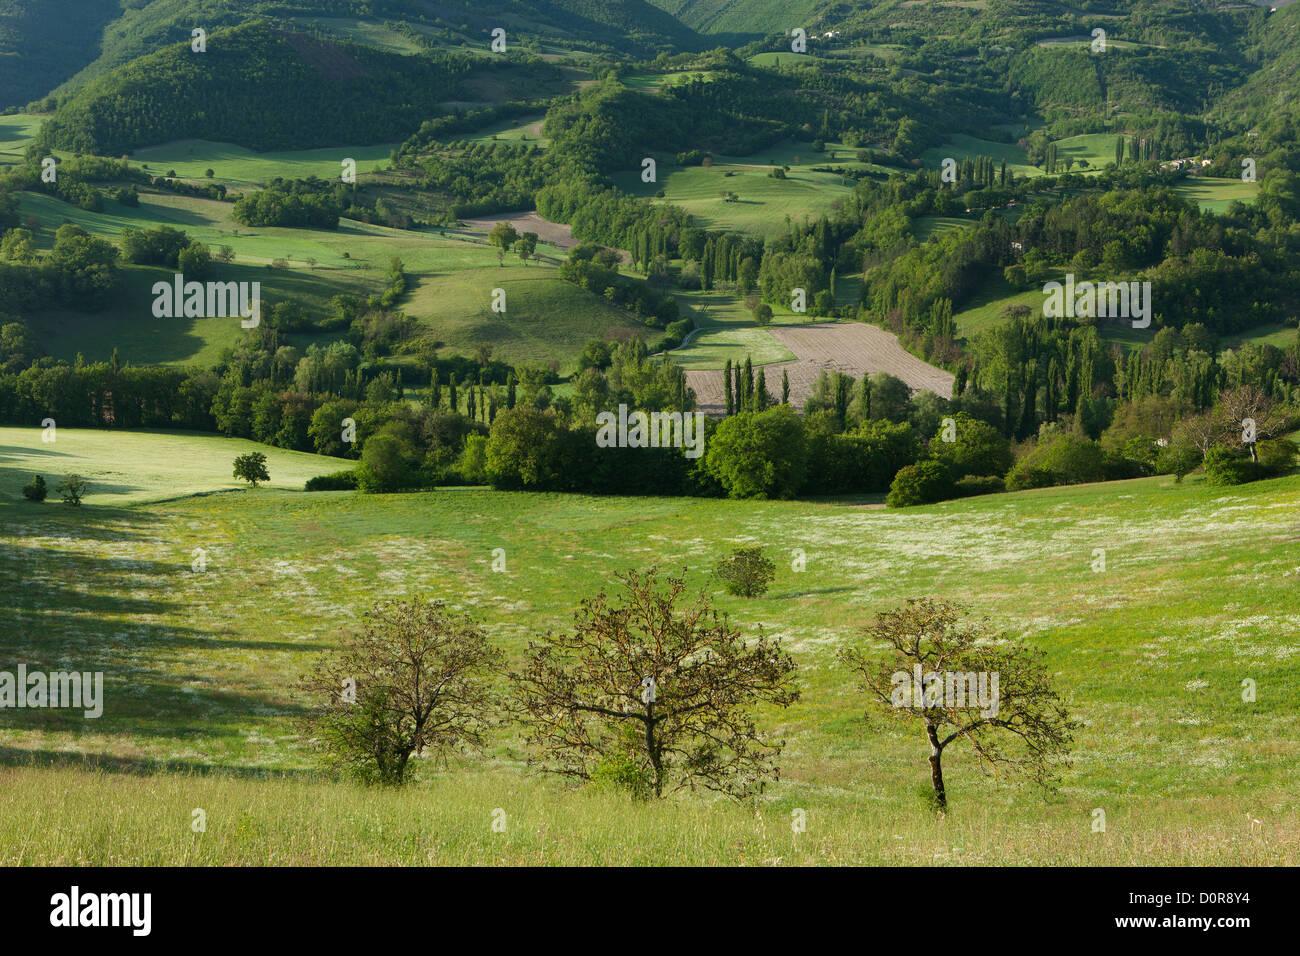 the Valnerina, Monti Sibillini National Park, Umbria, Italy - Stock Image